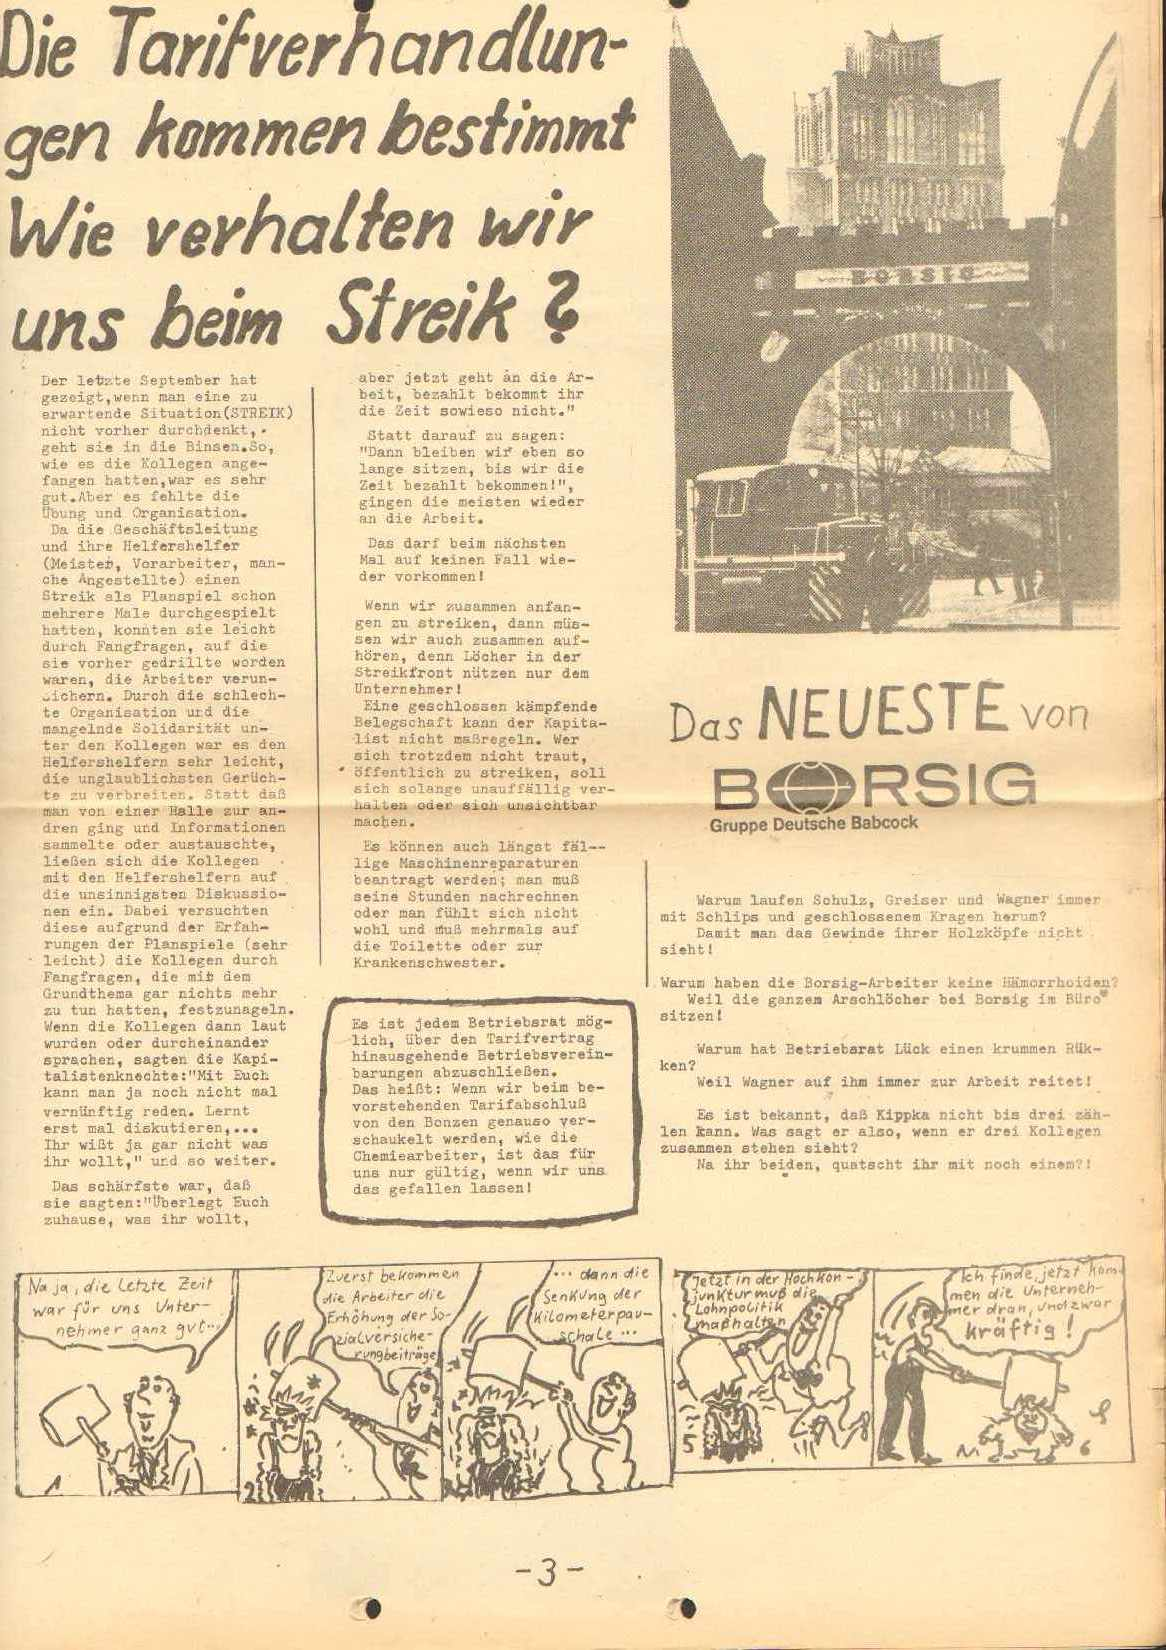 Berlin_Borsig005